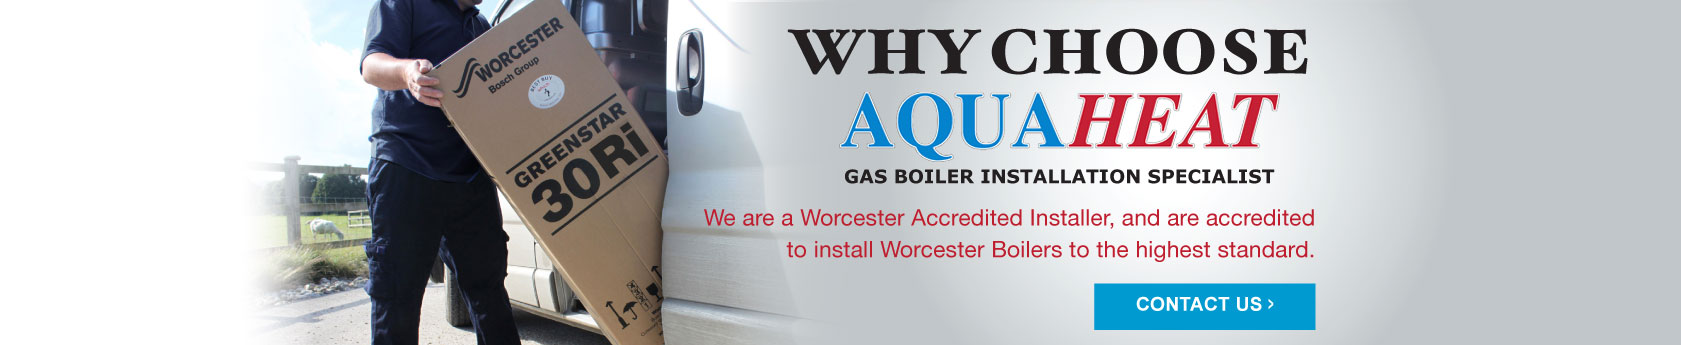 boiler_installation_banner